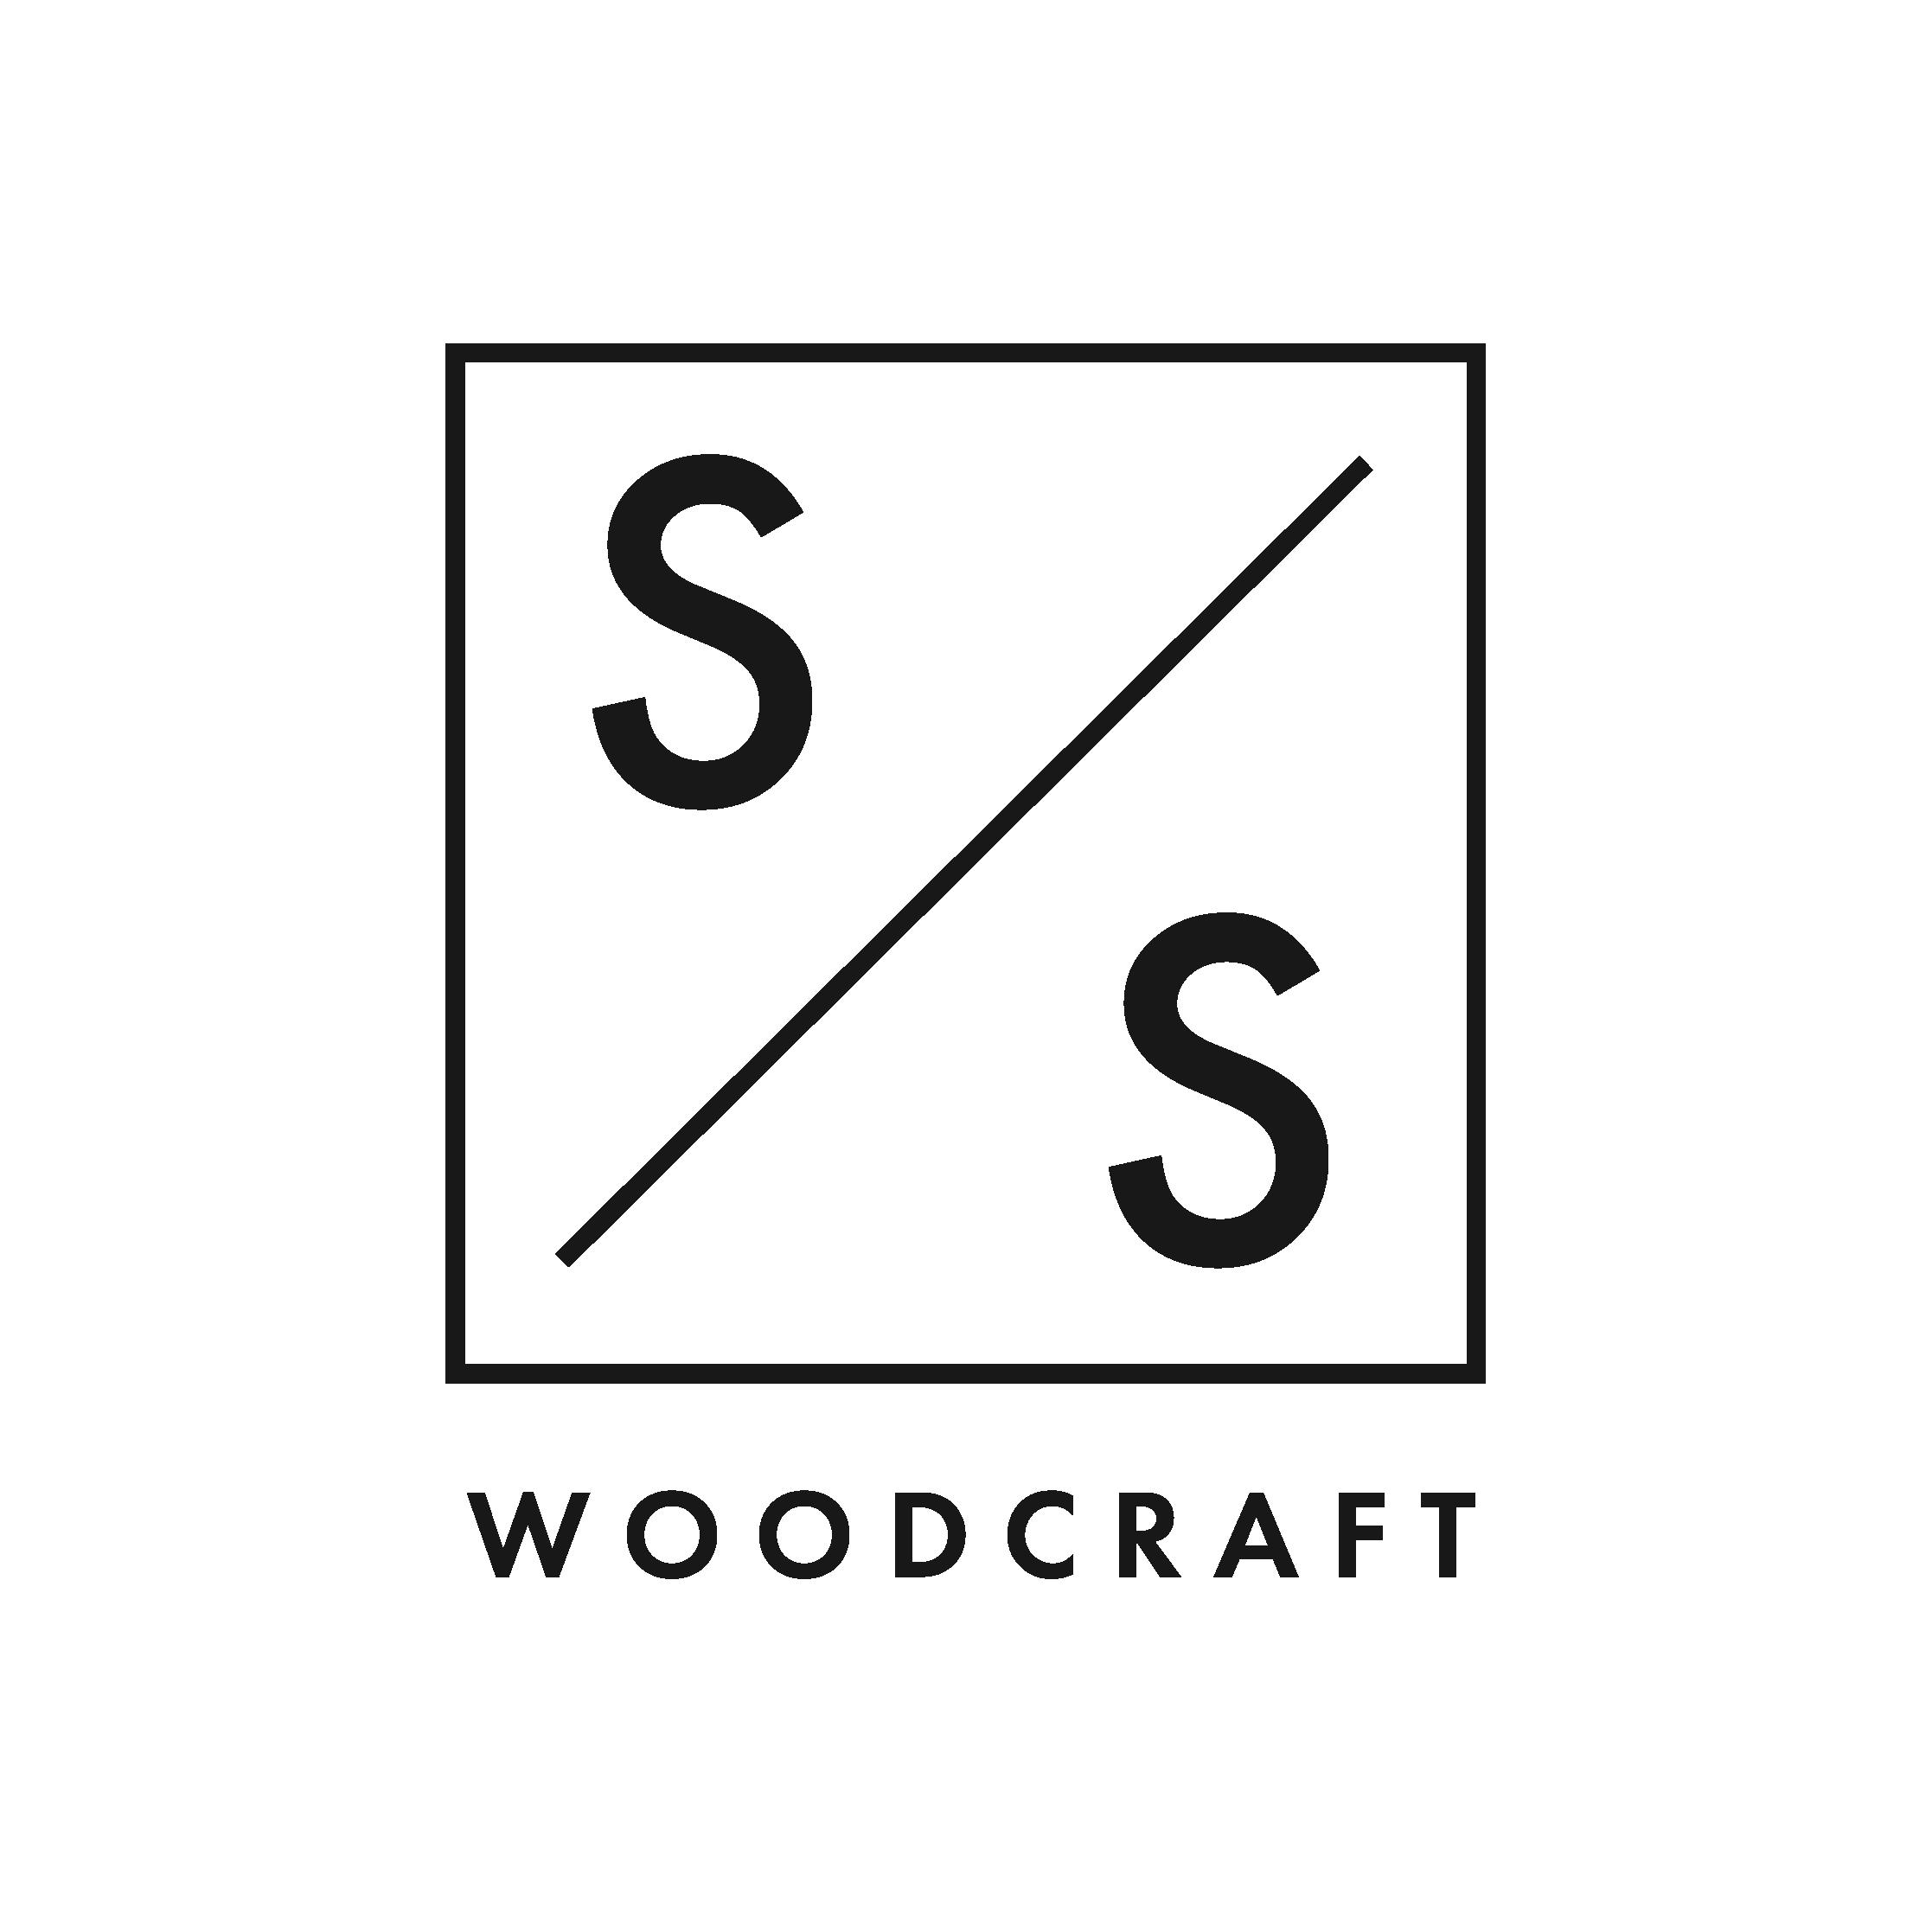 S&S Woodcraft logo black